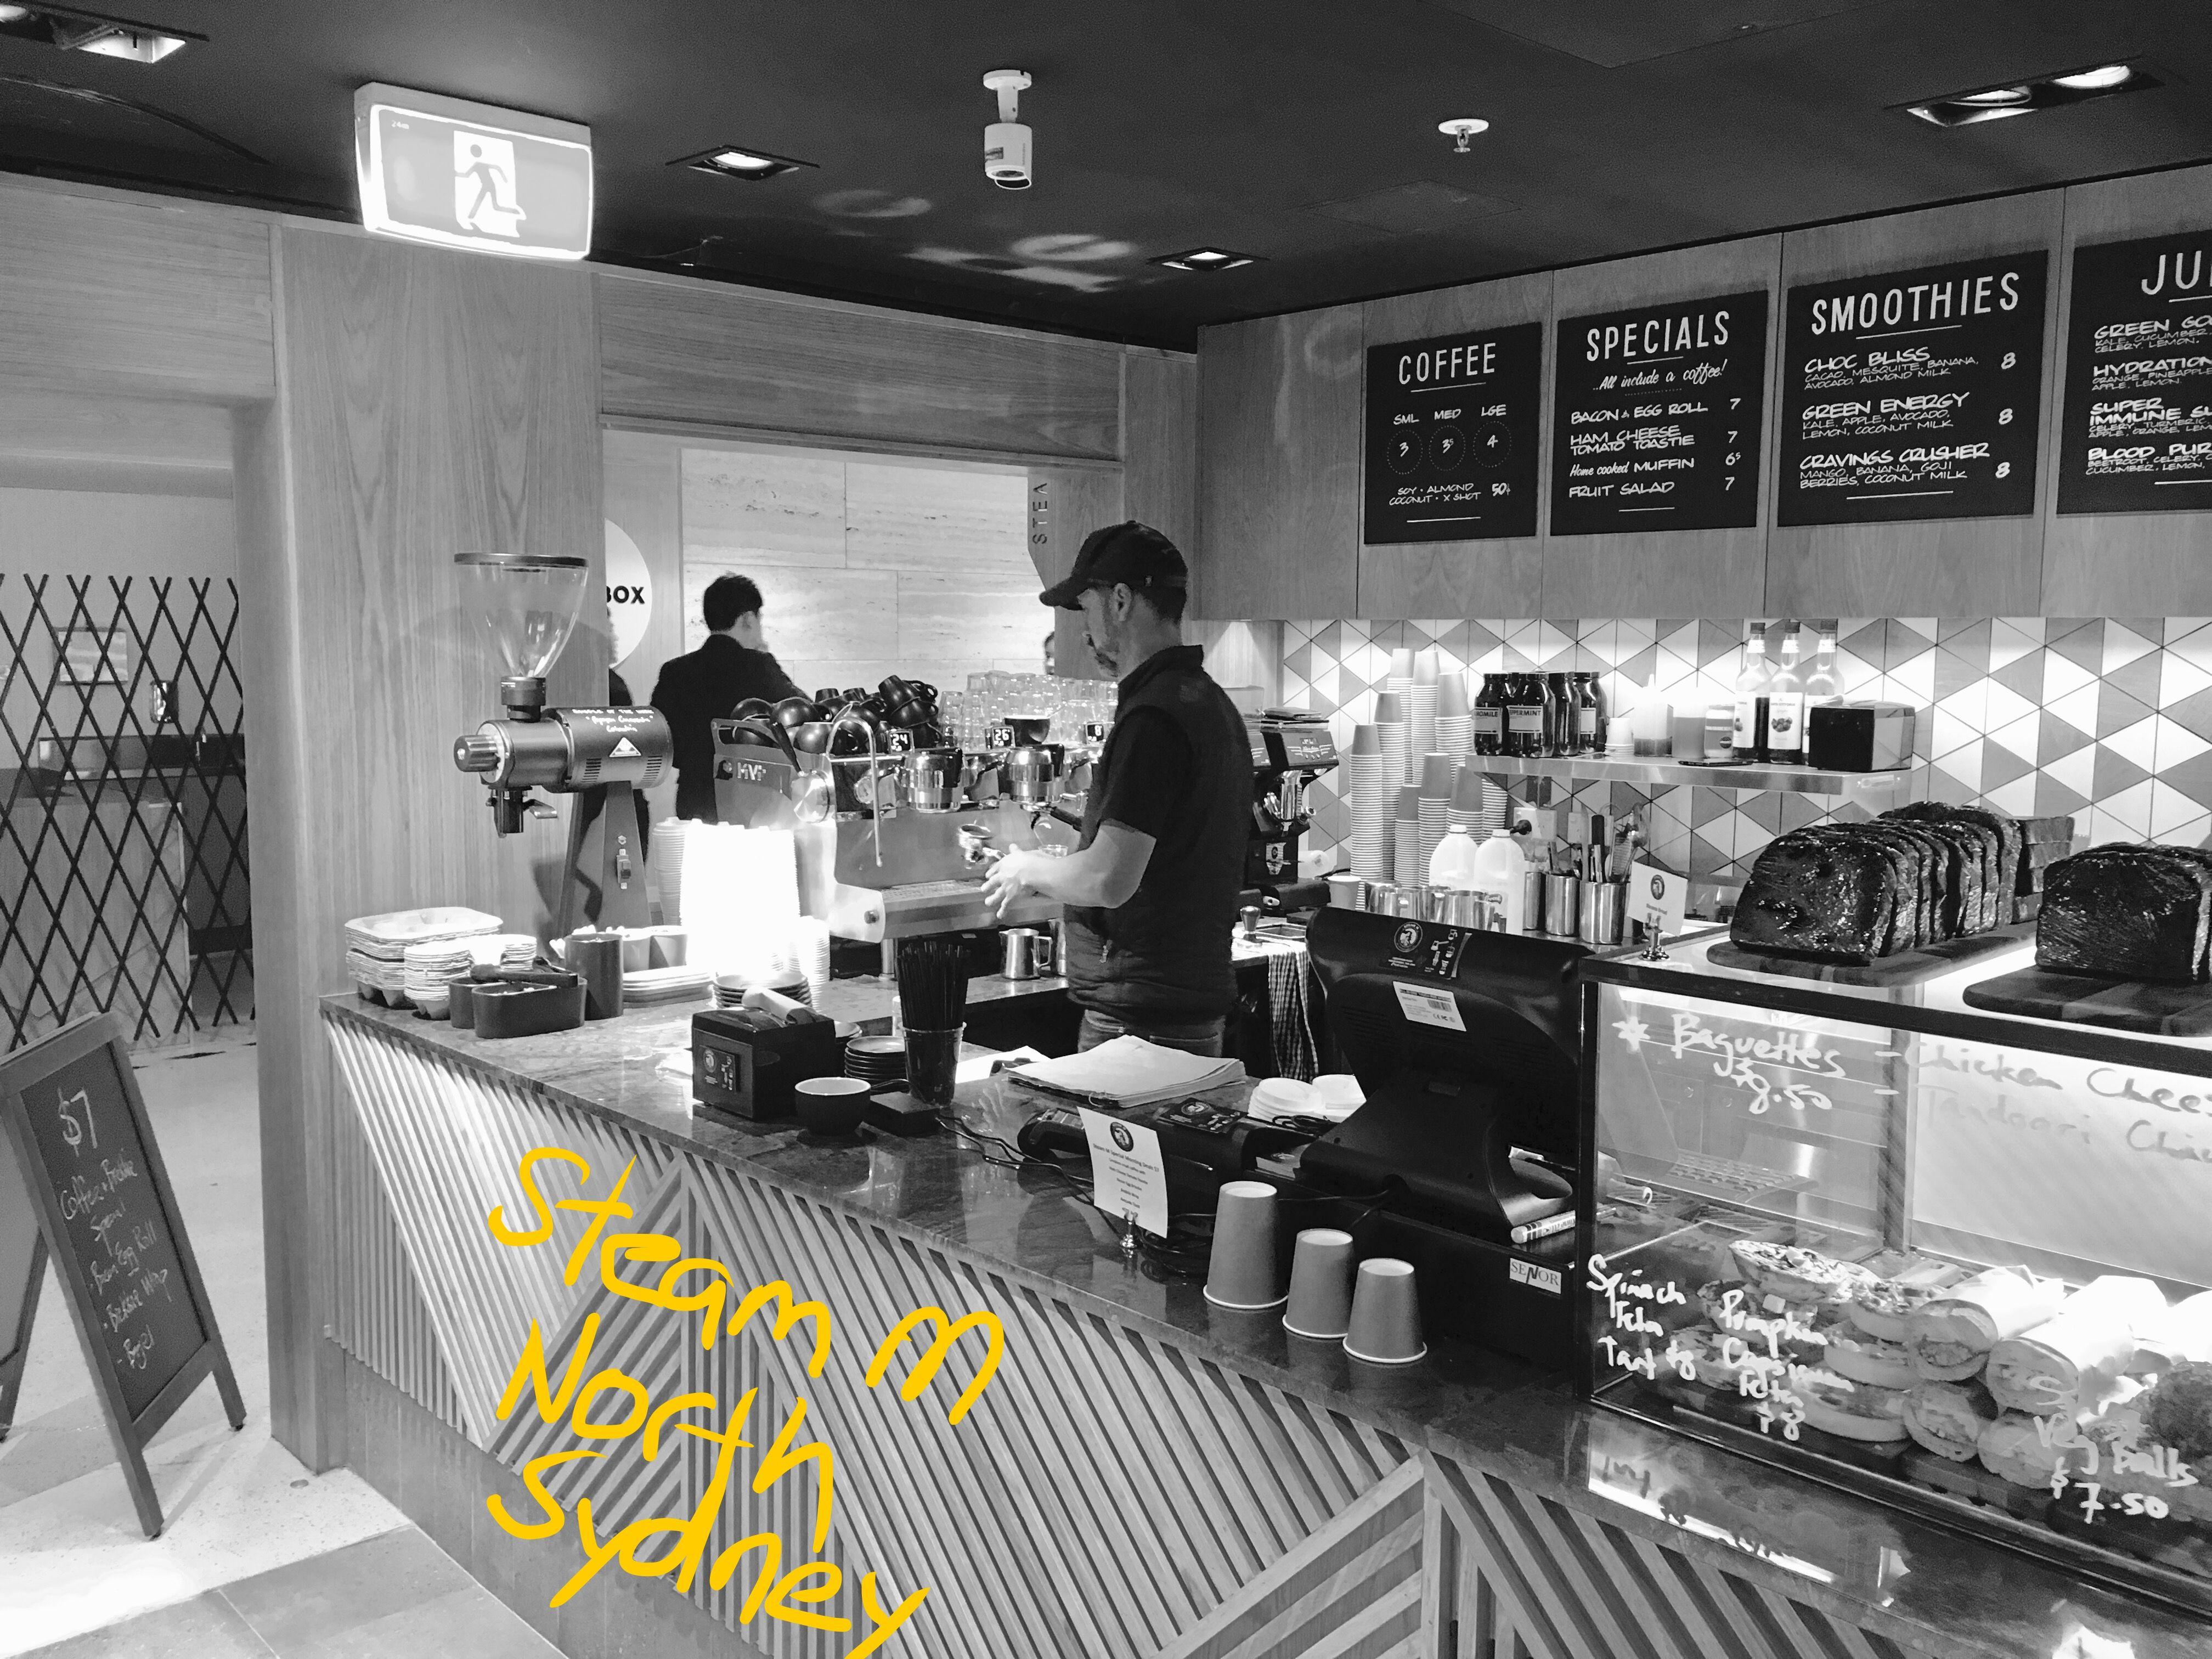 Steam M North Sydney Coffee 5 Senses 8 10 Coffeetone